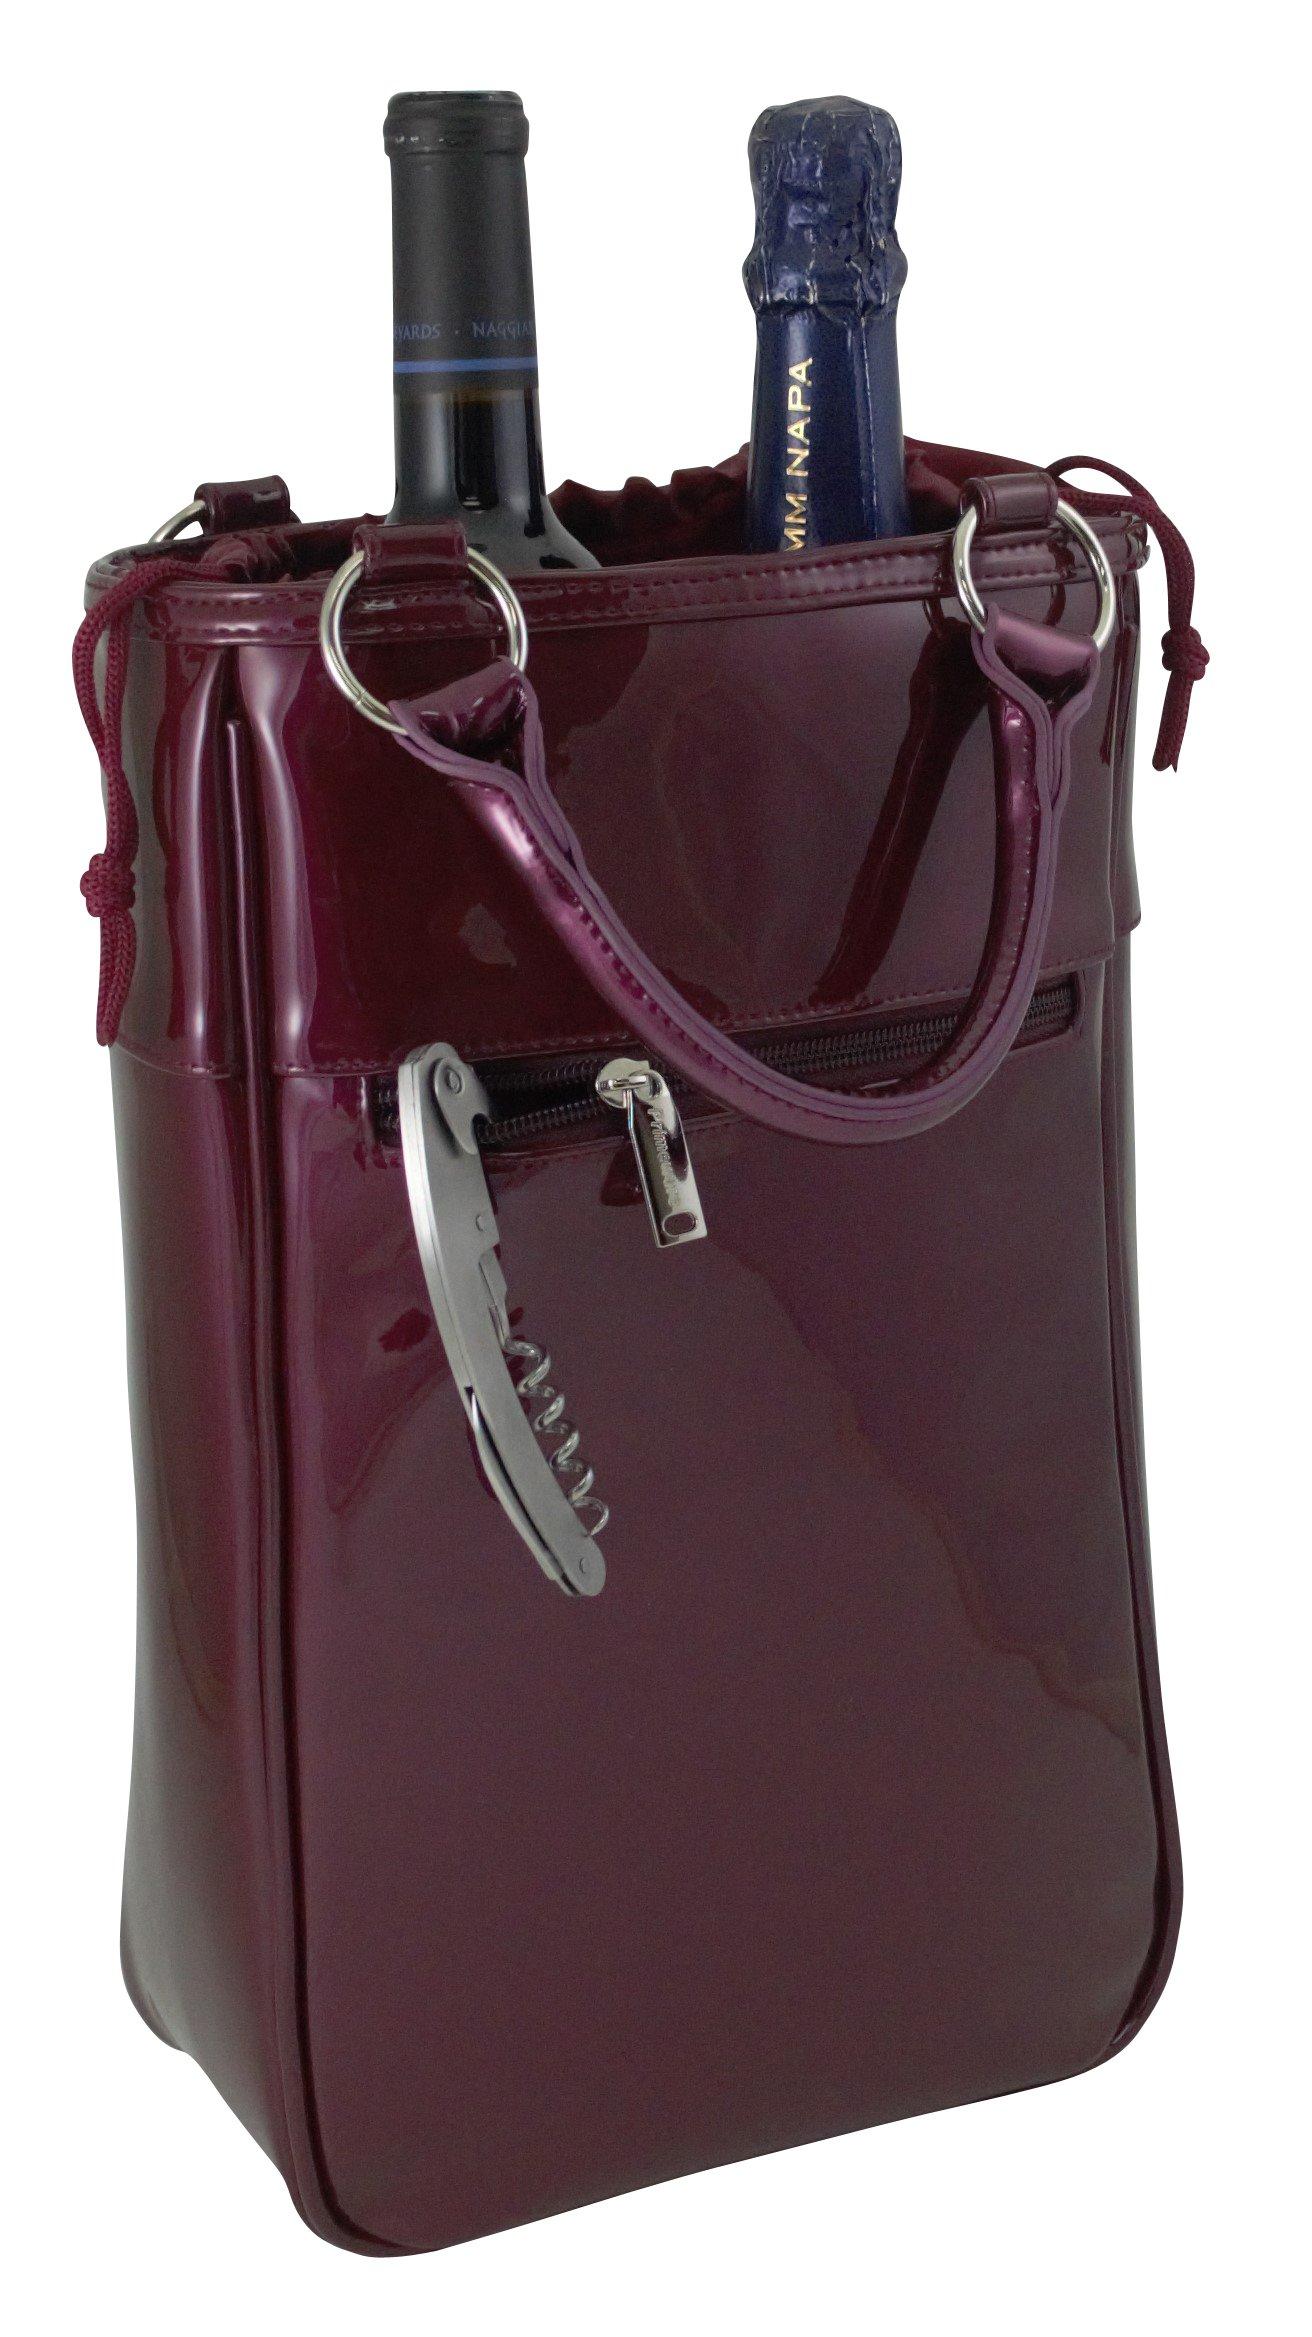 Primeware Harmony Insulated Two Bottle Wine Tote (Purple Candy)